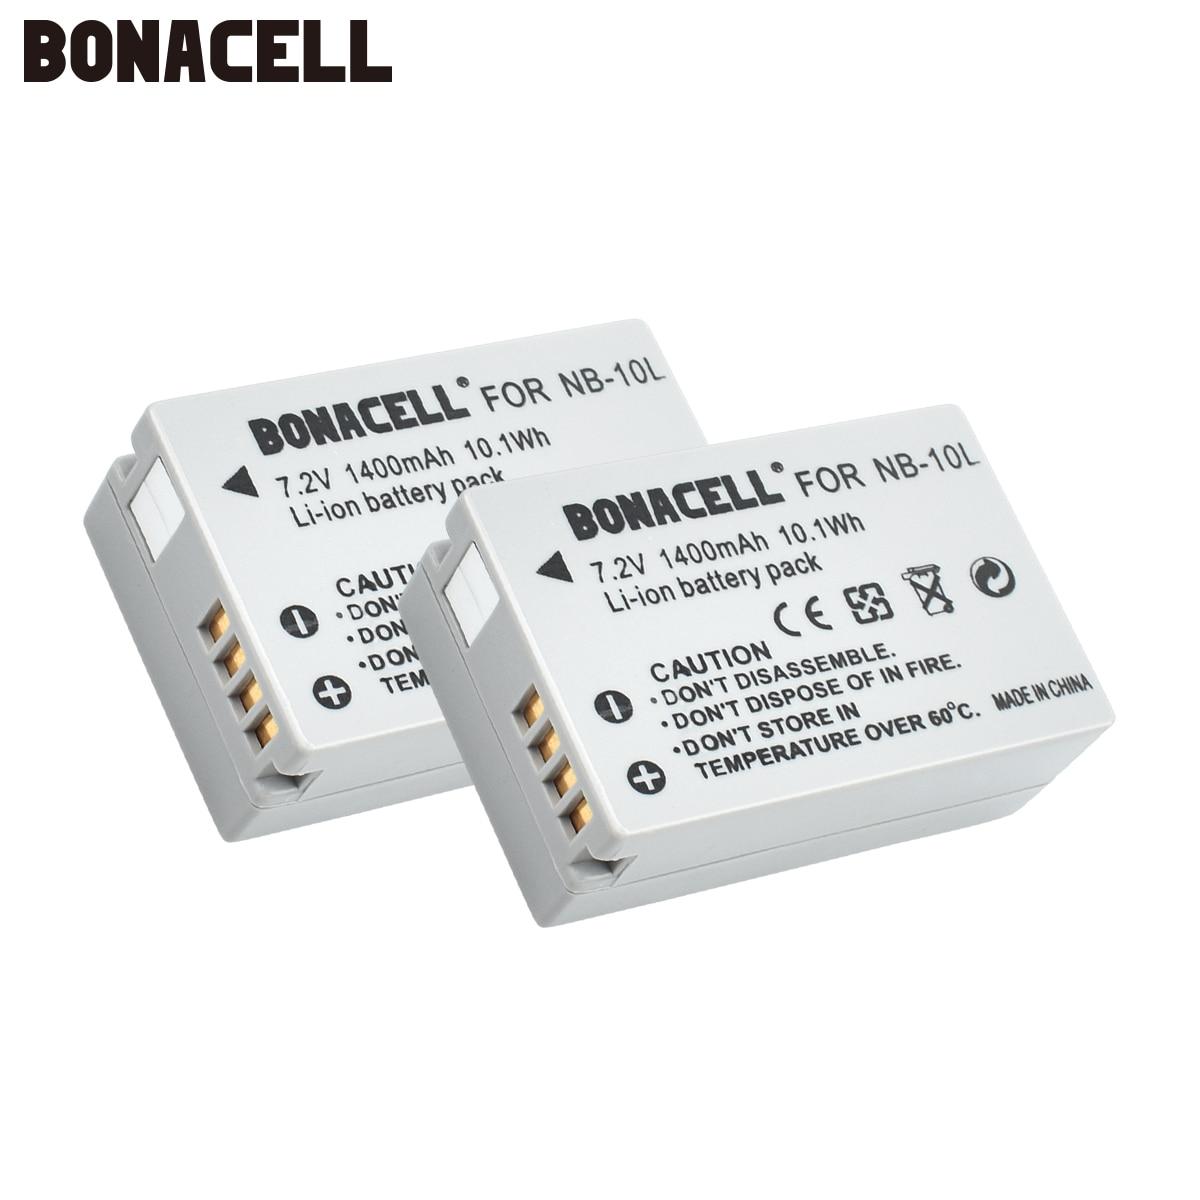 Bonacell 7,2 V 1400mAh NB-10L NB10L NB 10L baterías para Canon G1X G15 G16 SX40HS SX50HS SX60HS SX40 SX50 SX60 HS Bateria L50